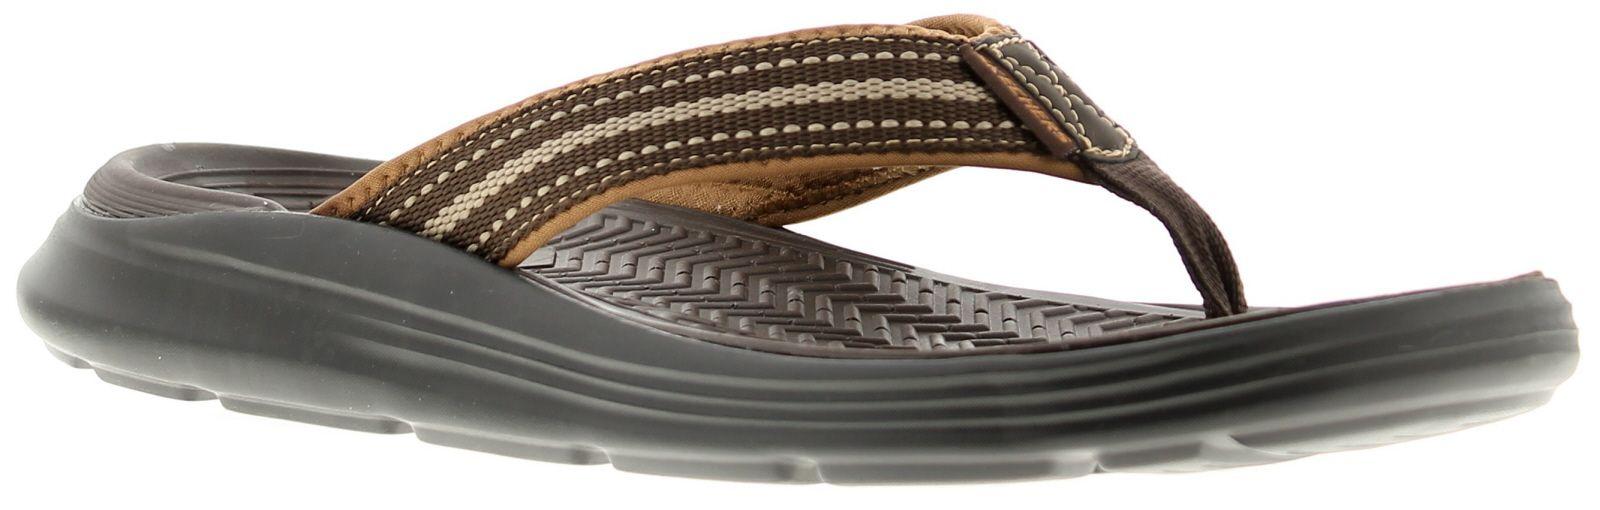 Skechers Sargo Mens Beach Sandals Chocolate Memory Foam